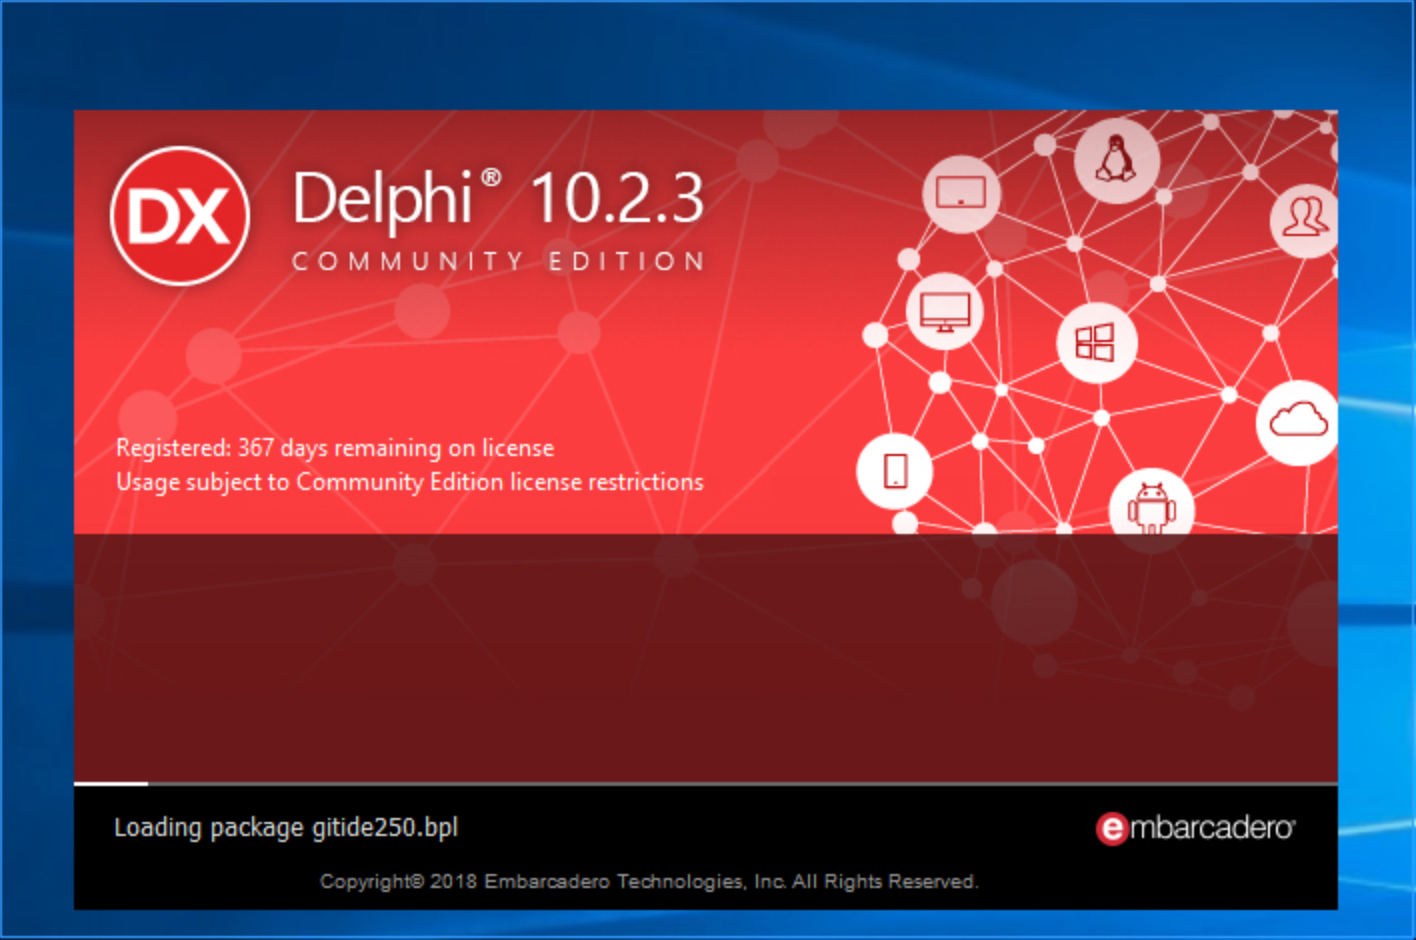 delphi-community-edition